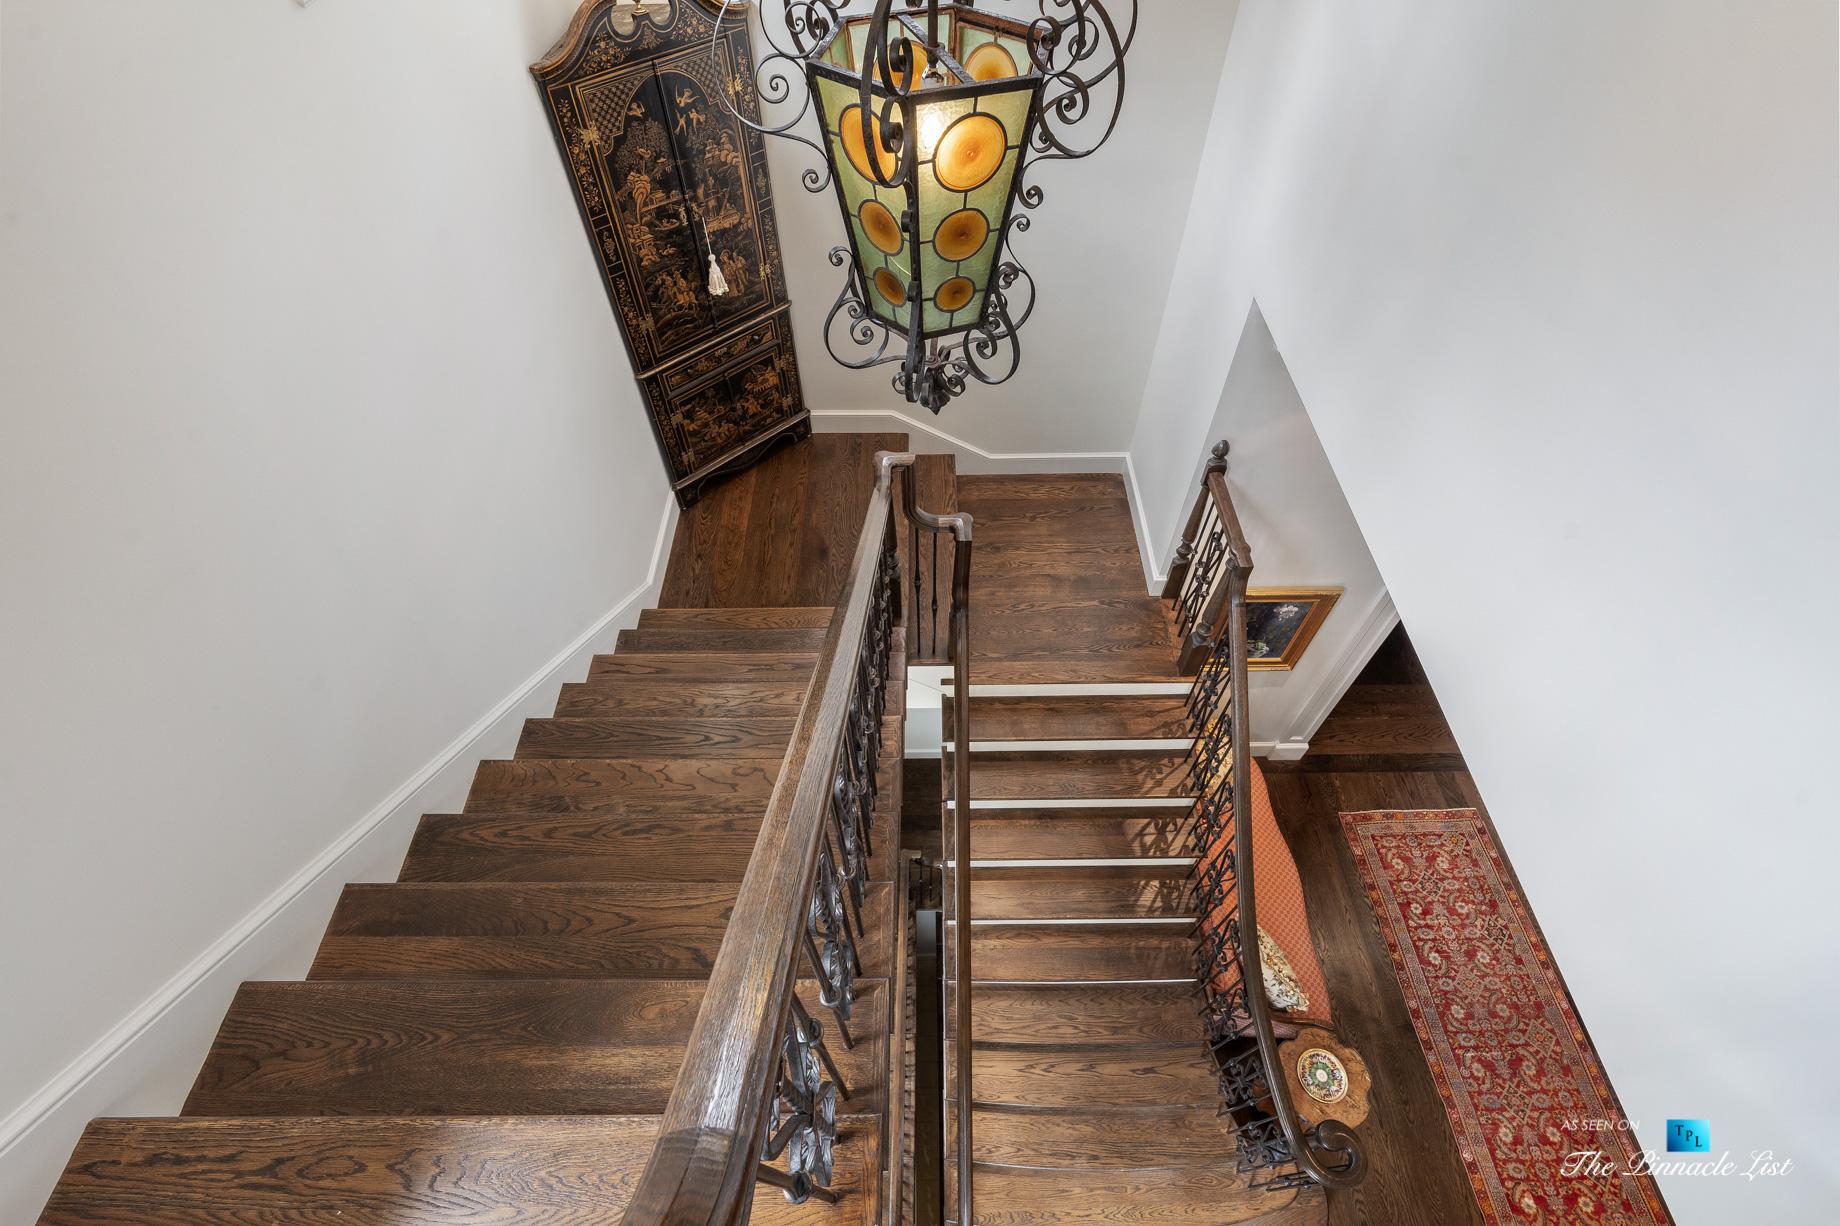 439 Blackland Rd NW, Atlanta, GA, USA - Stairs - Luxury Real Estate - Tuxedo Park Mediterranean Mansion Home